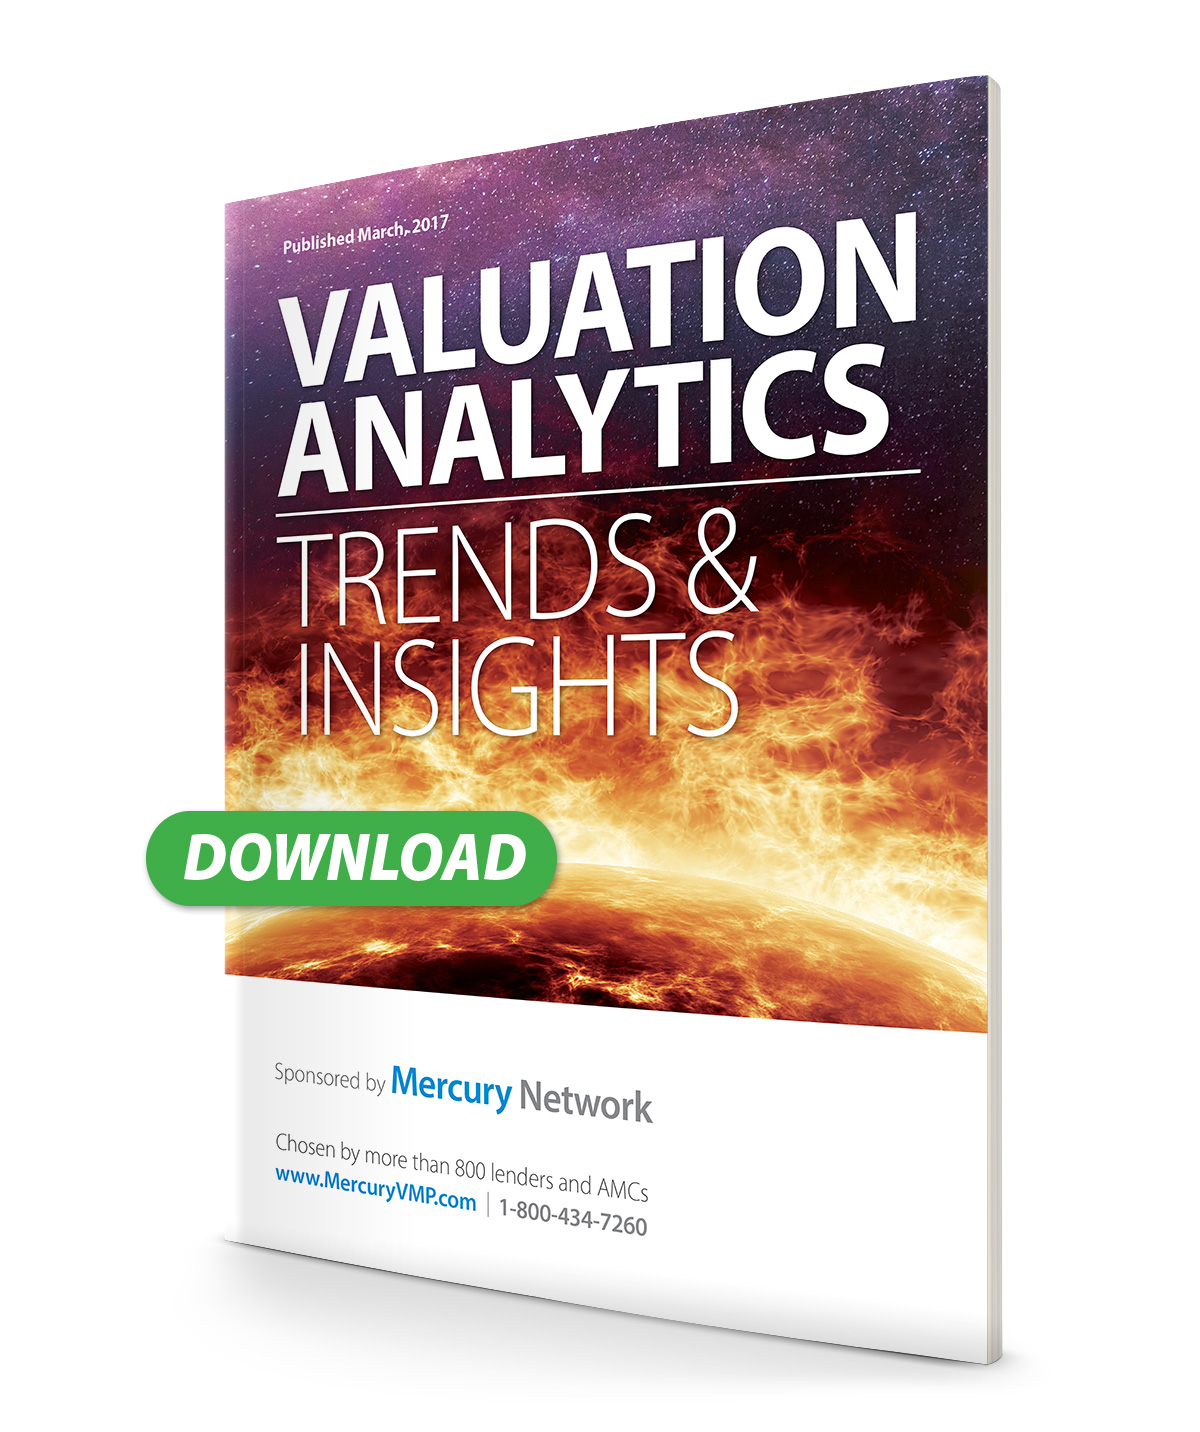 ValuationAnalyticsCover-leftfacing.jpg